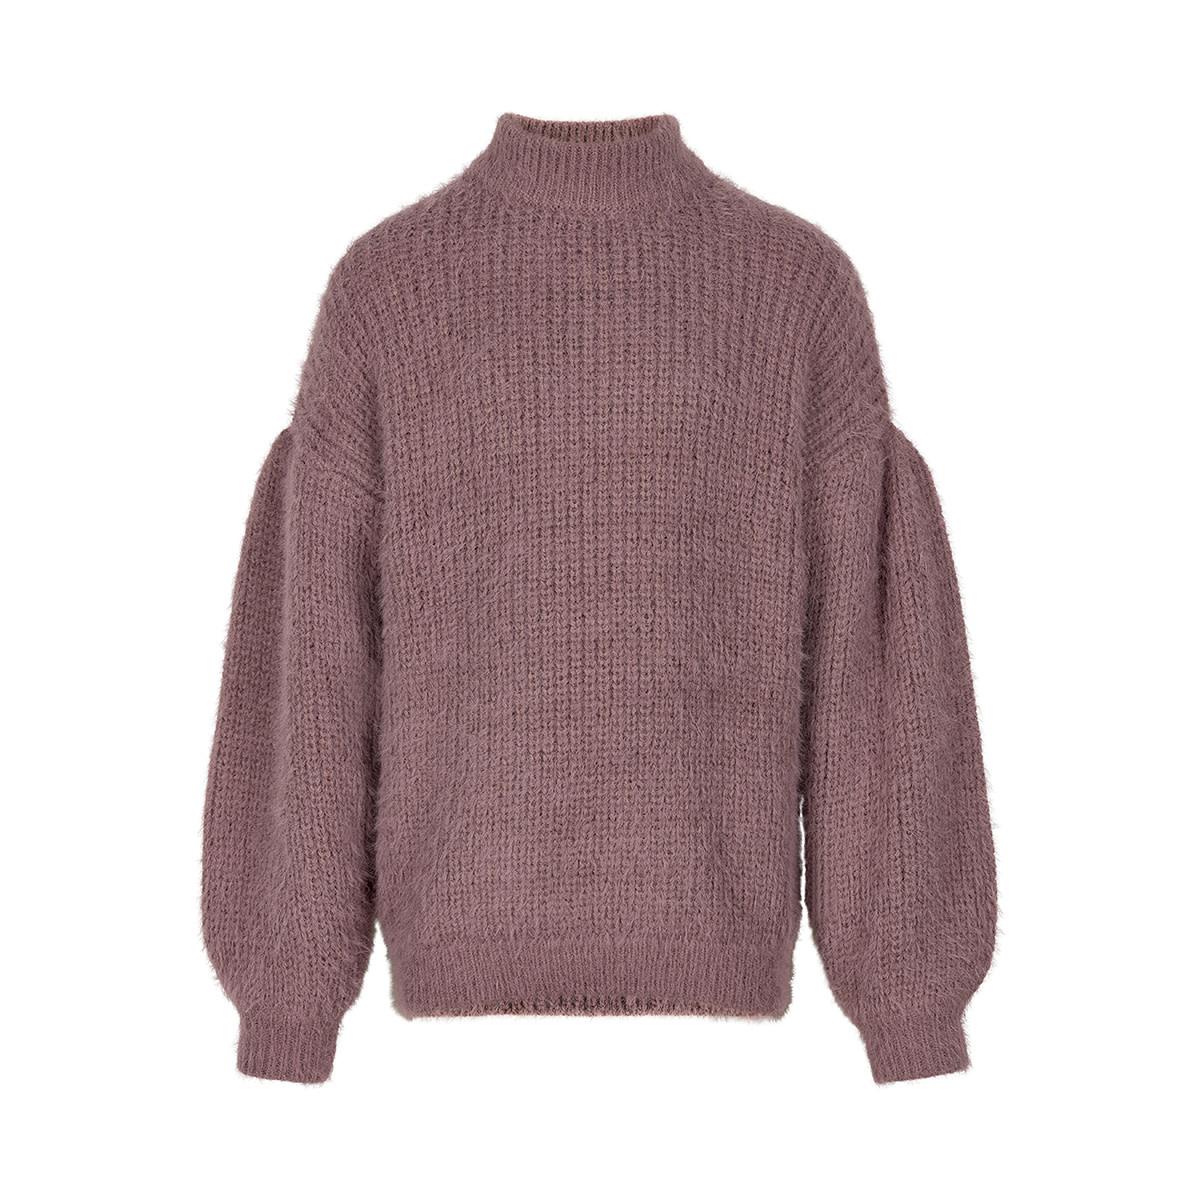 Fuzzy Puff Sleeve Sweater